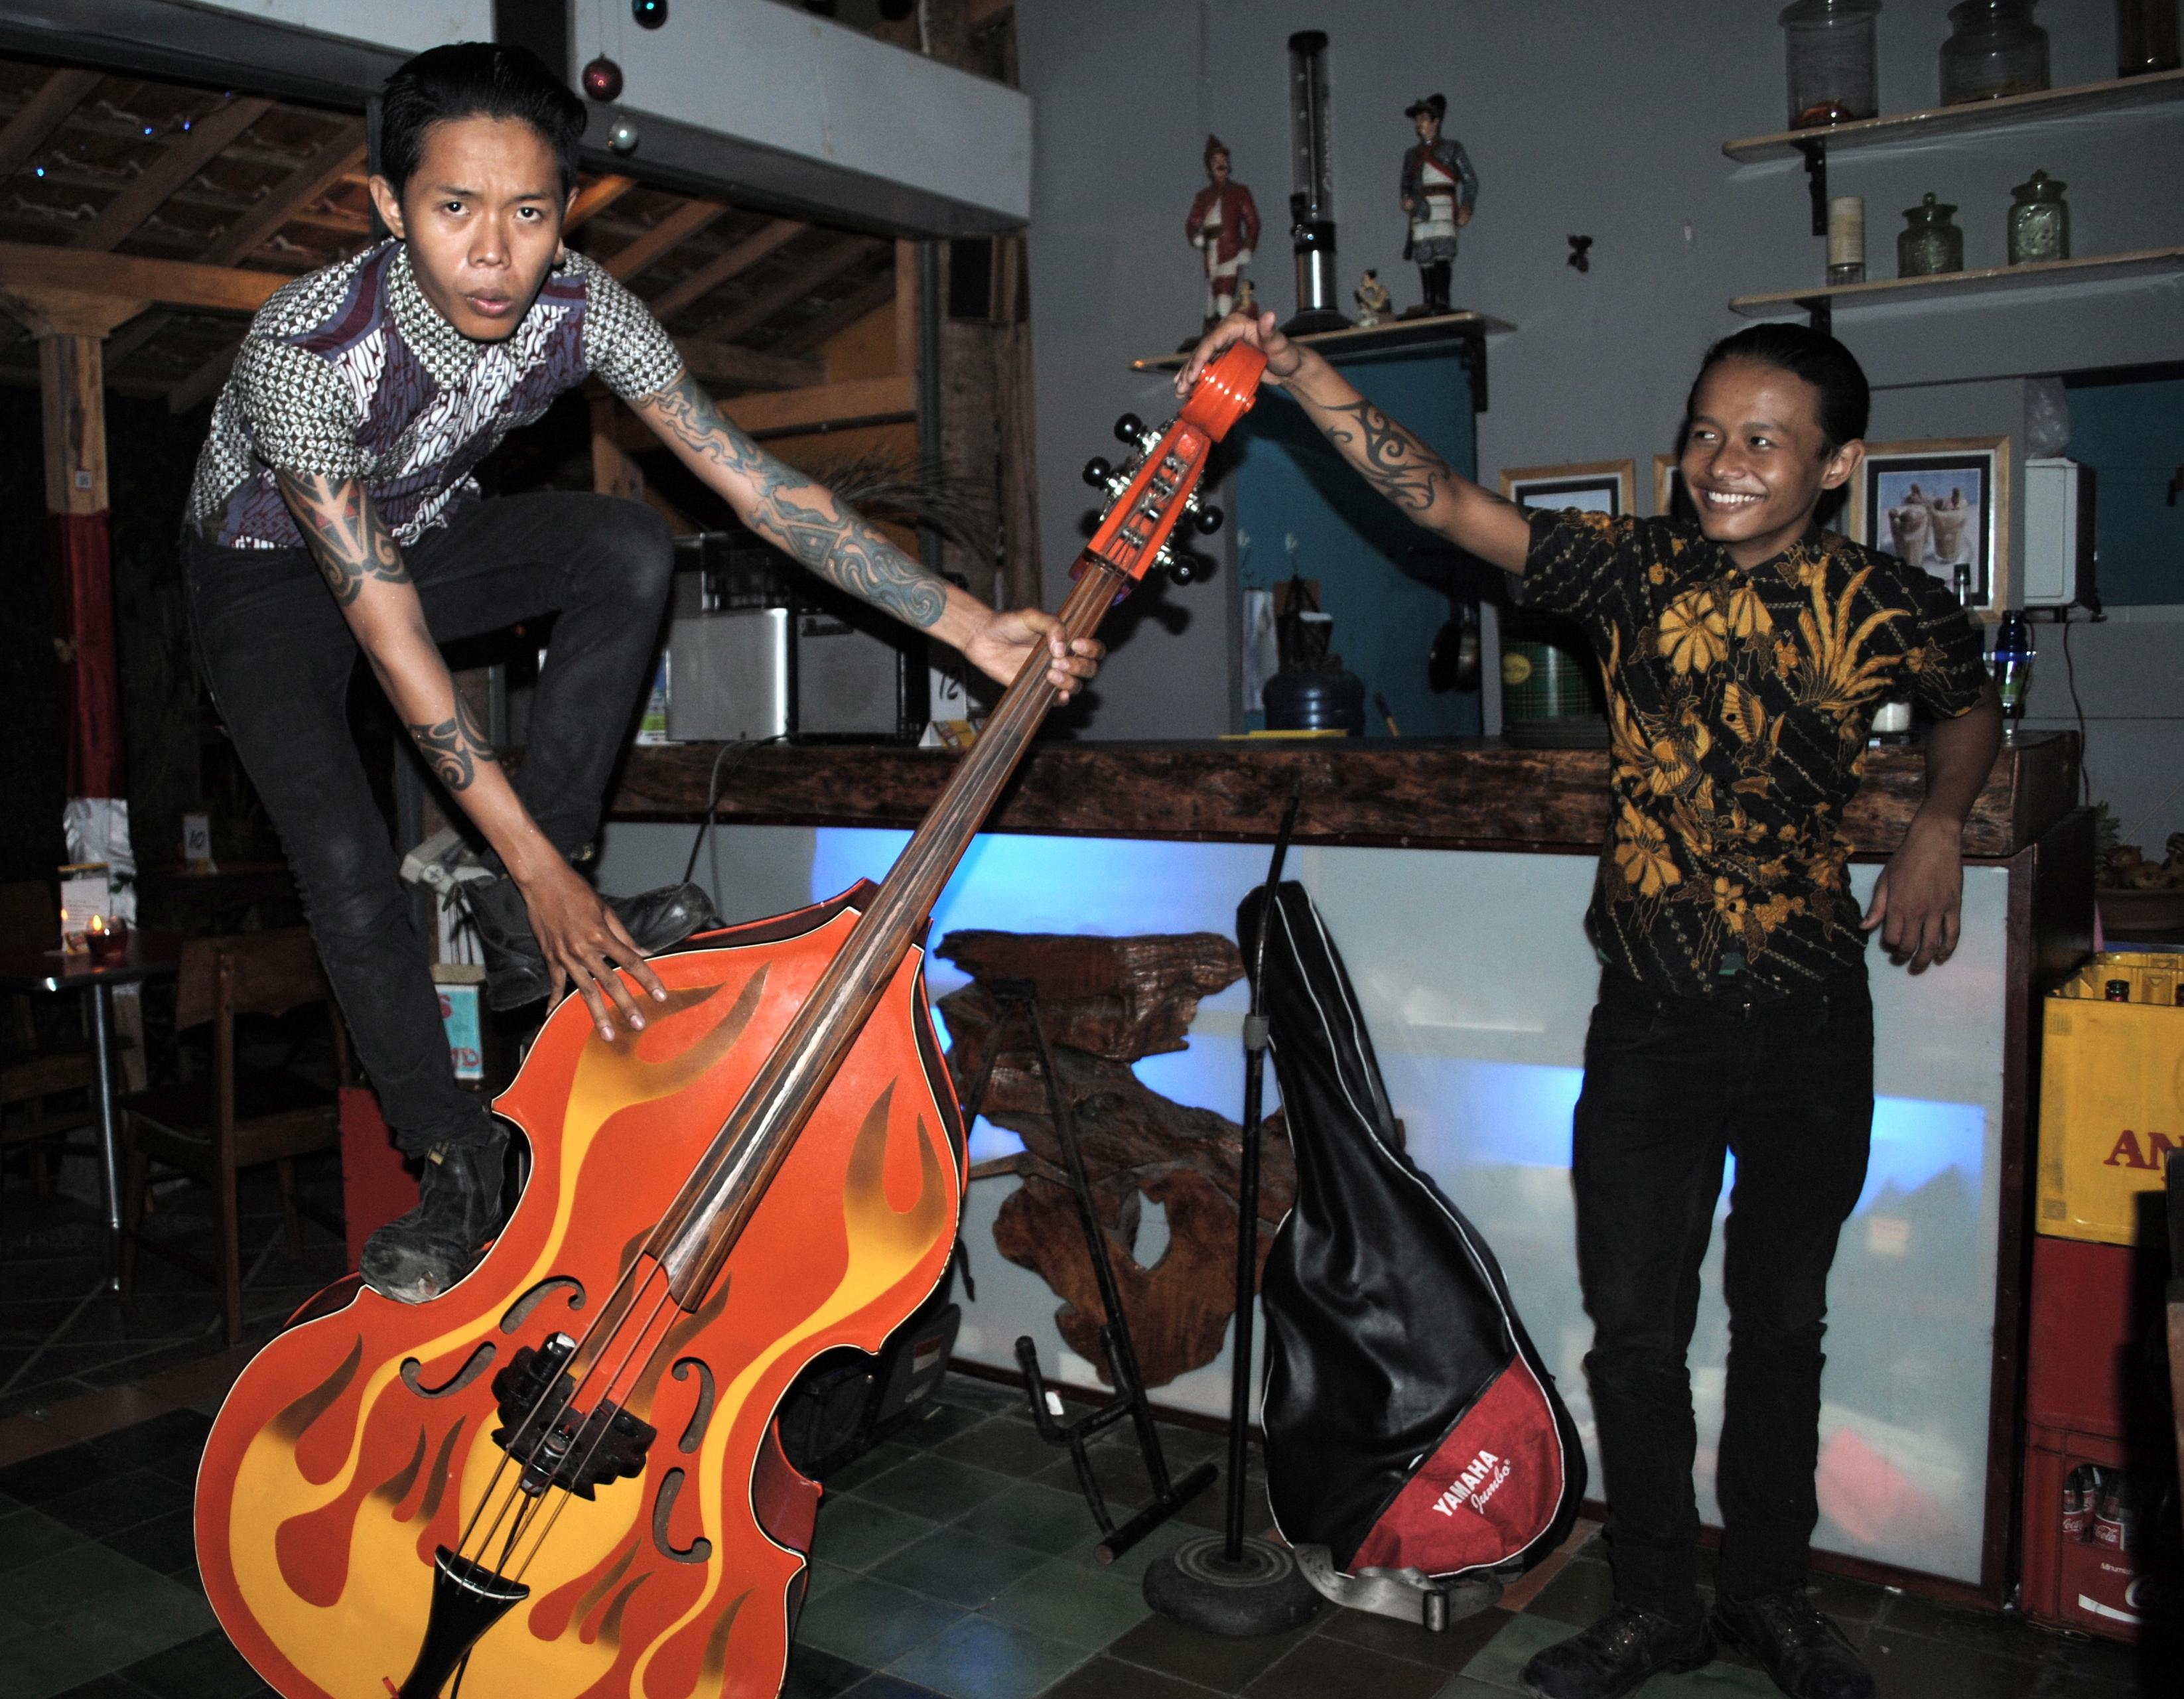 Yogyakarta – місто хіппі